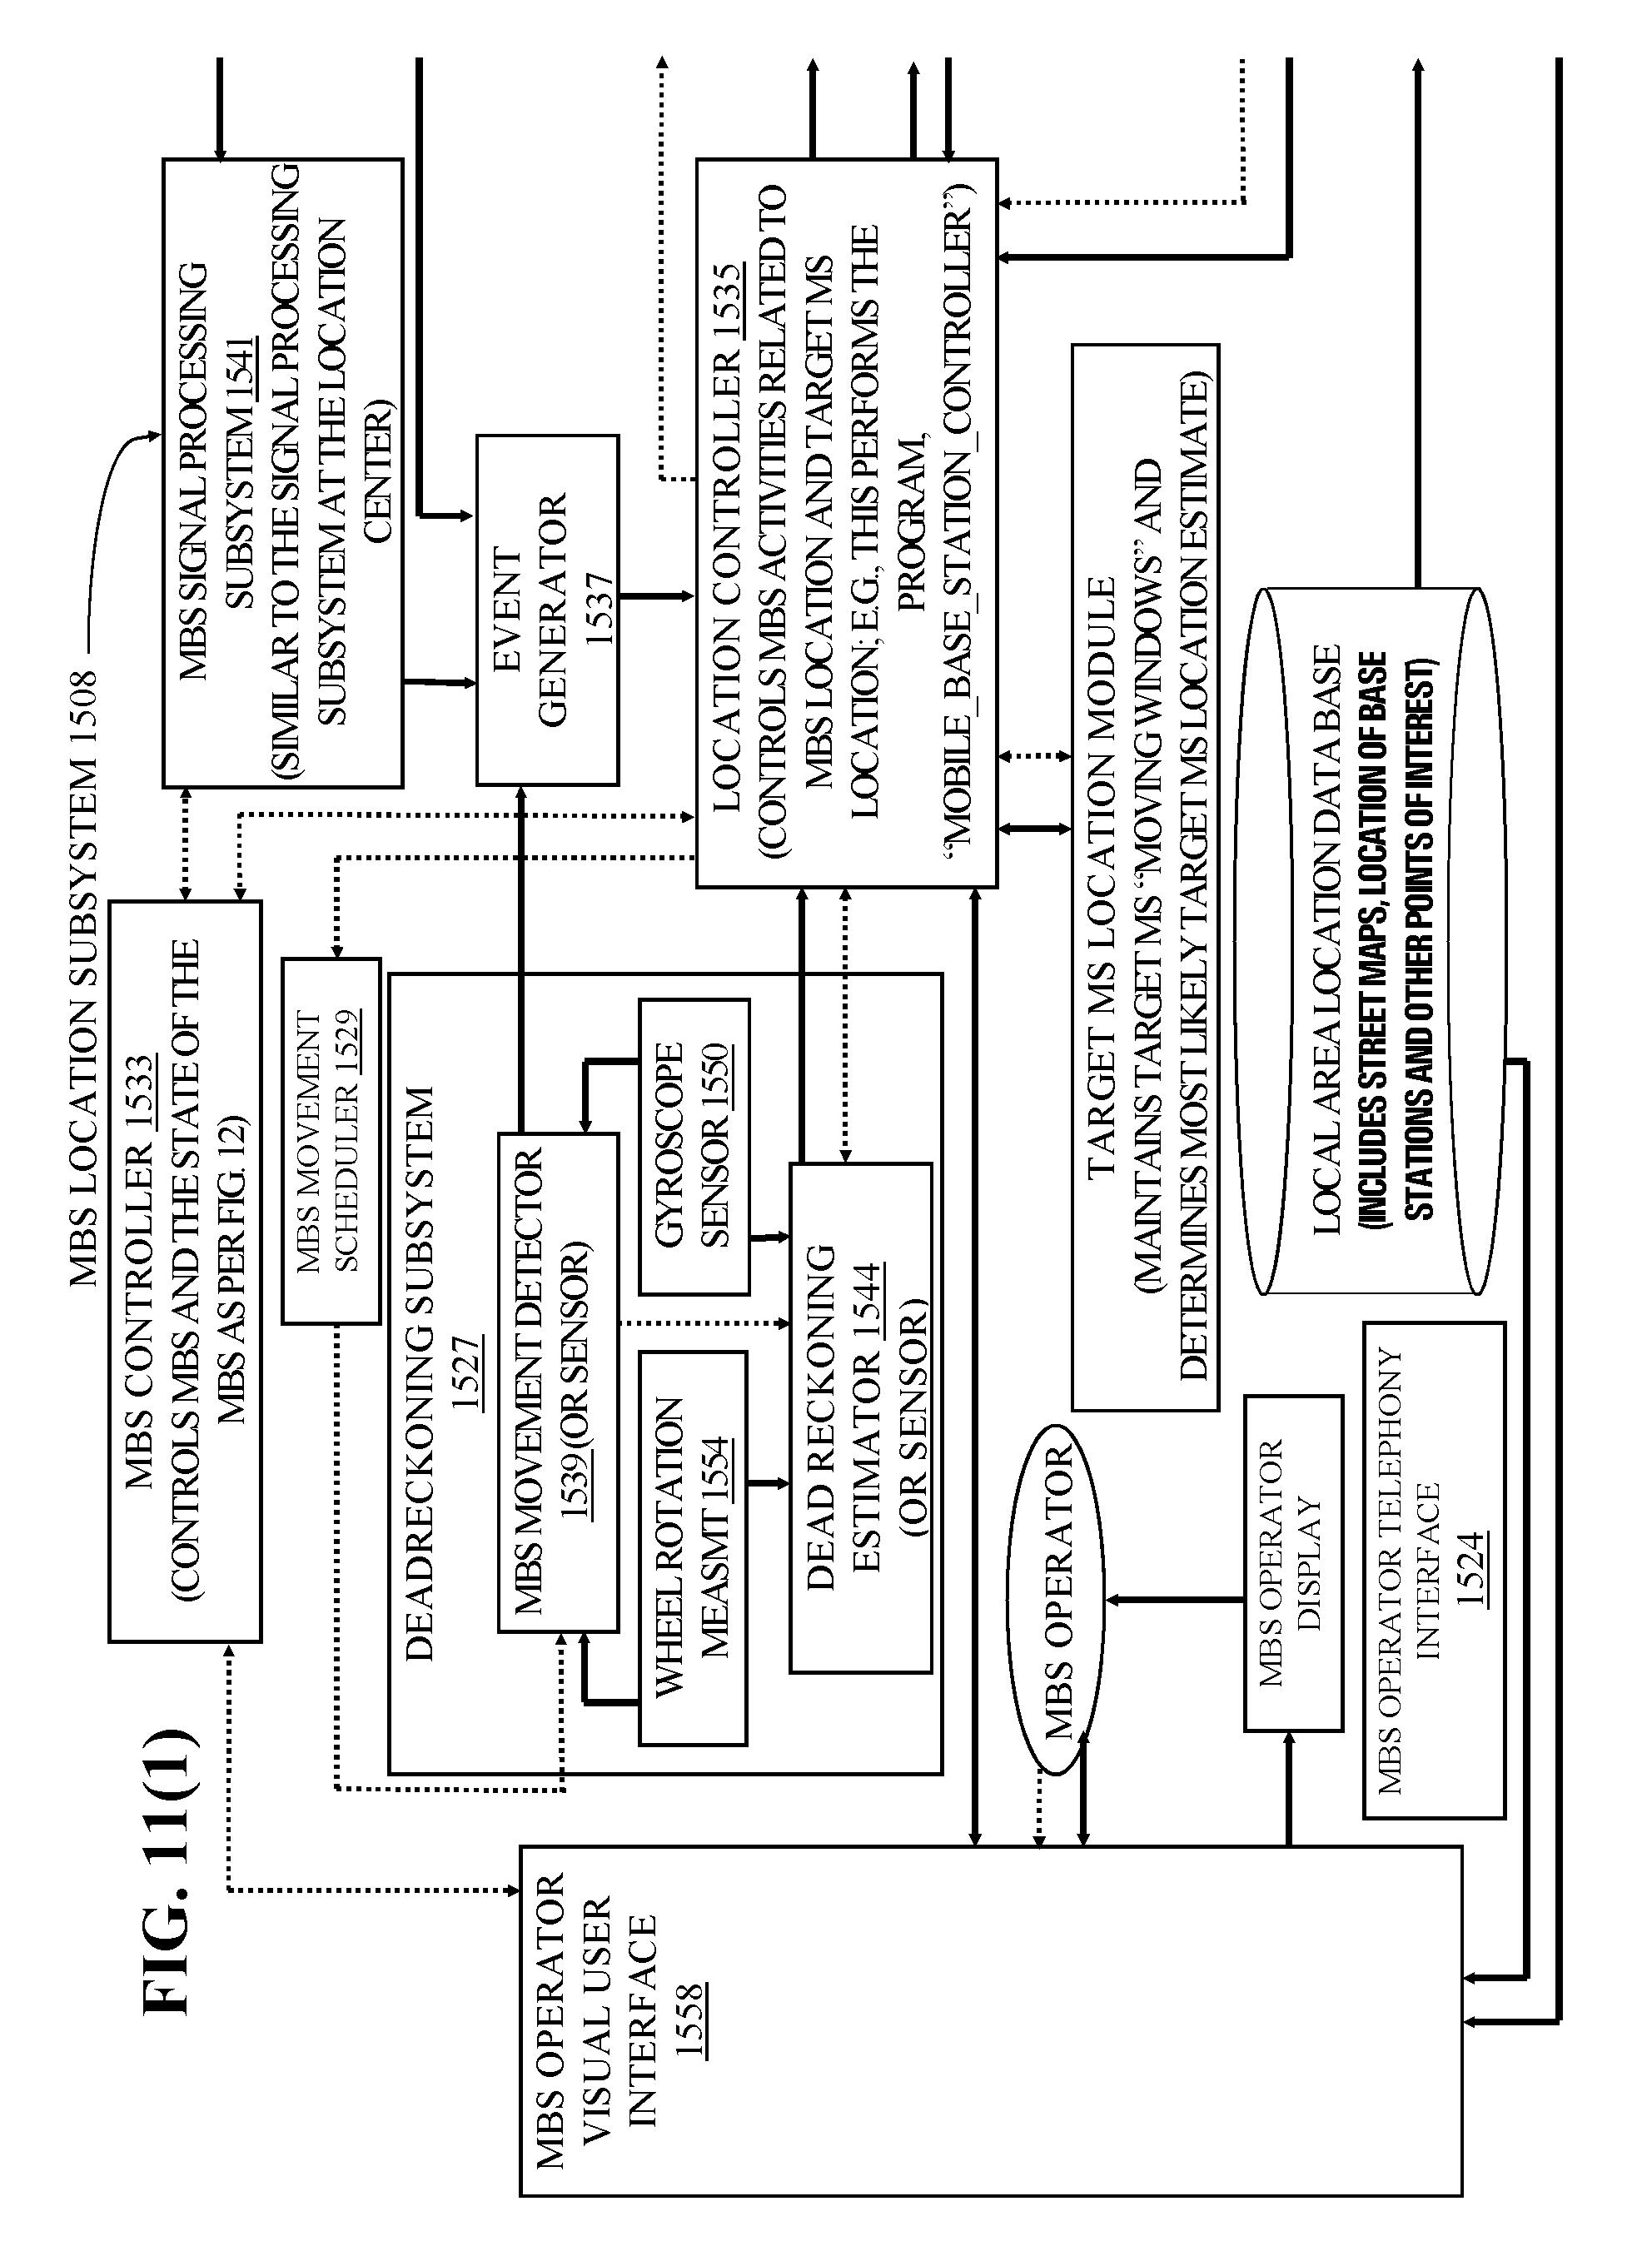 Patent US 9,134,398 B2 on